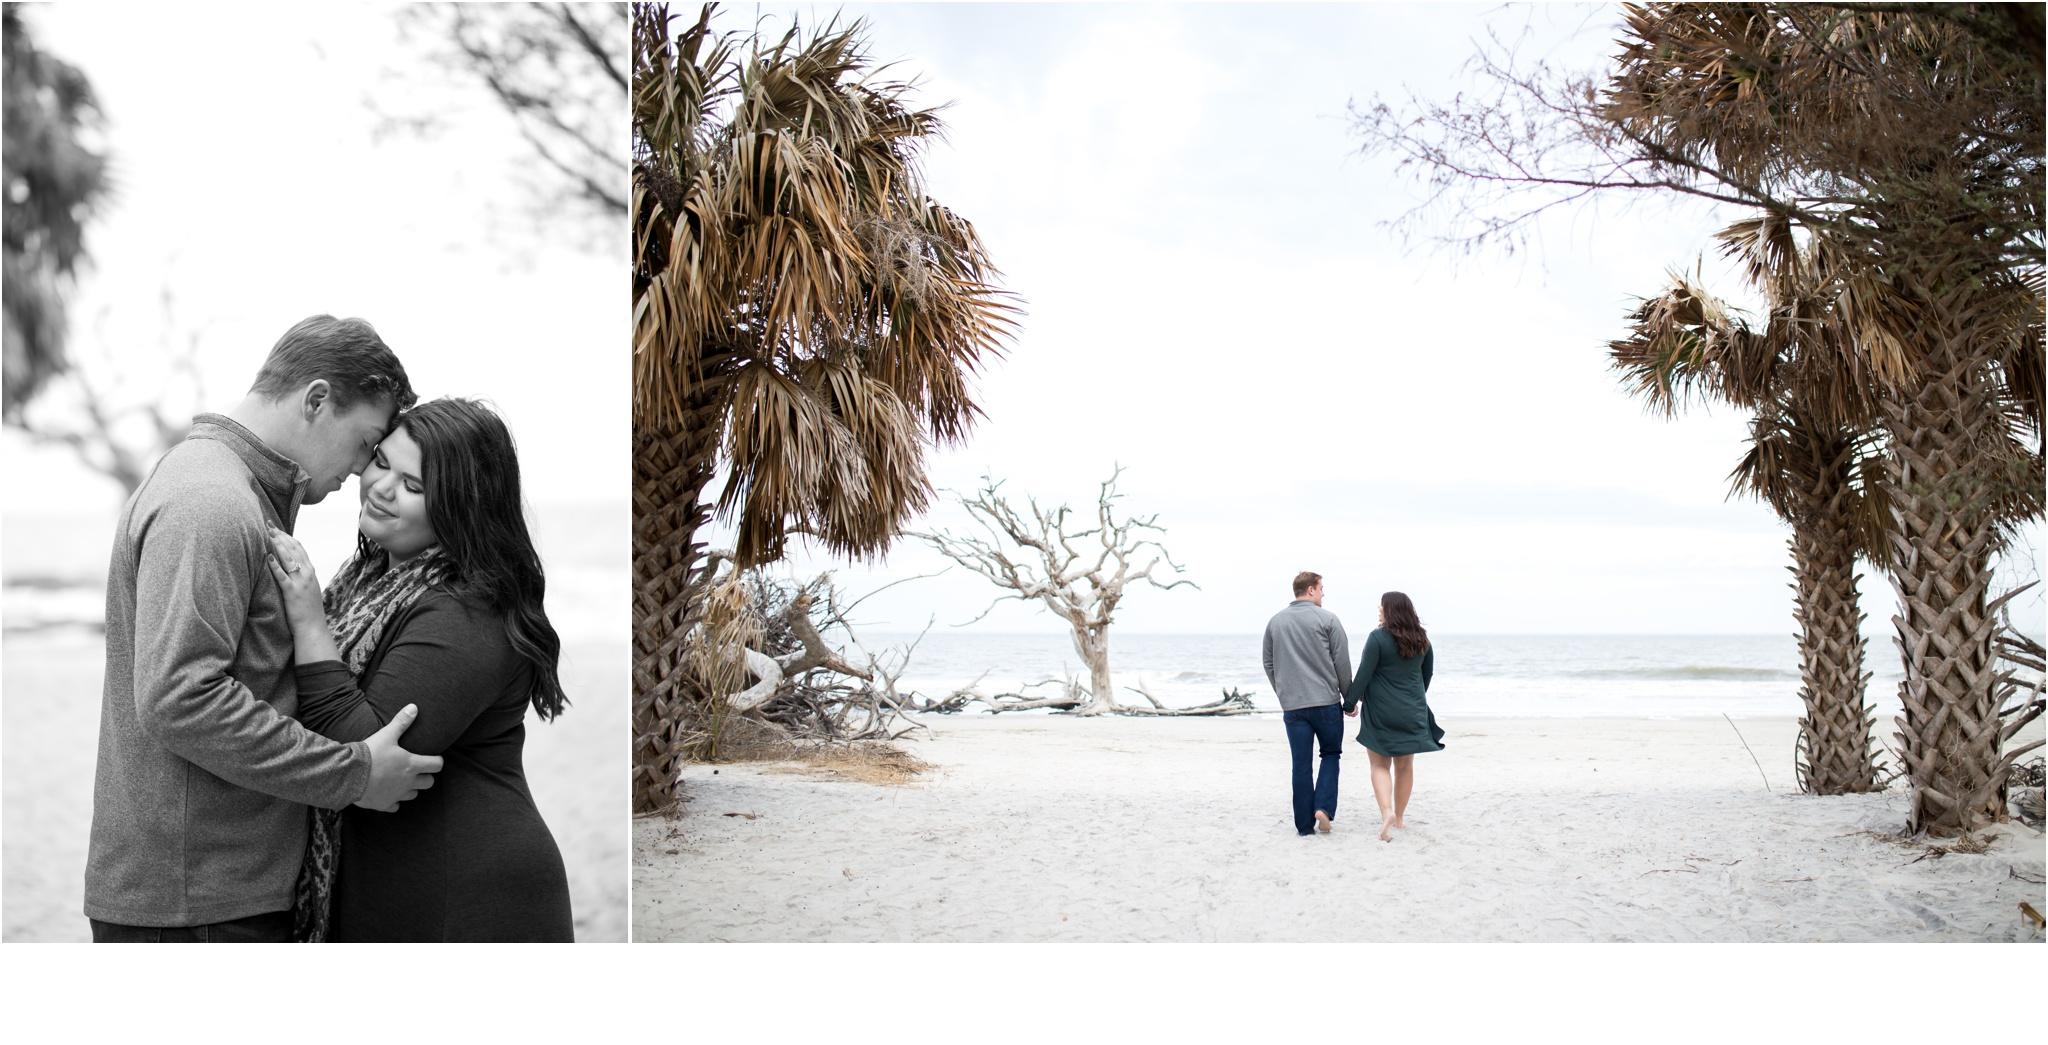 Rainey_Gregg_Photography_St._Simons_Island_Georgia_California_Wedding_Portrait_Photography_0589.jpg